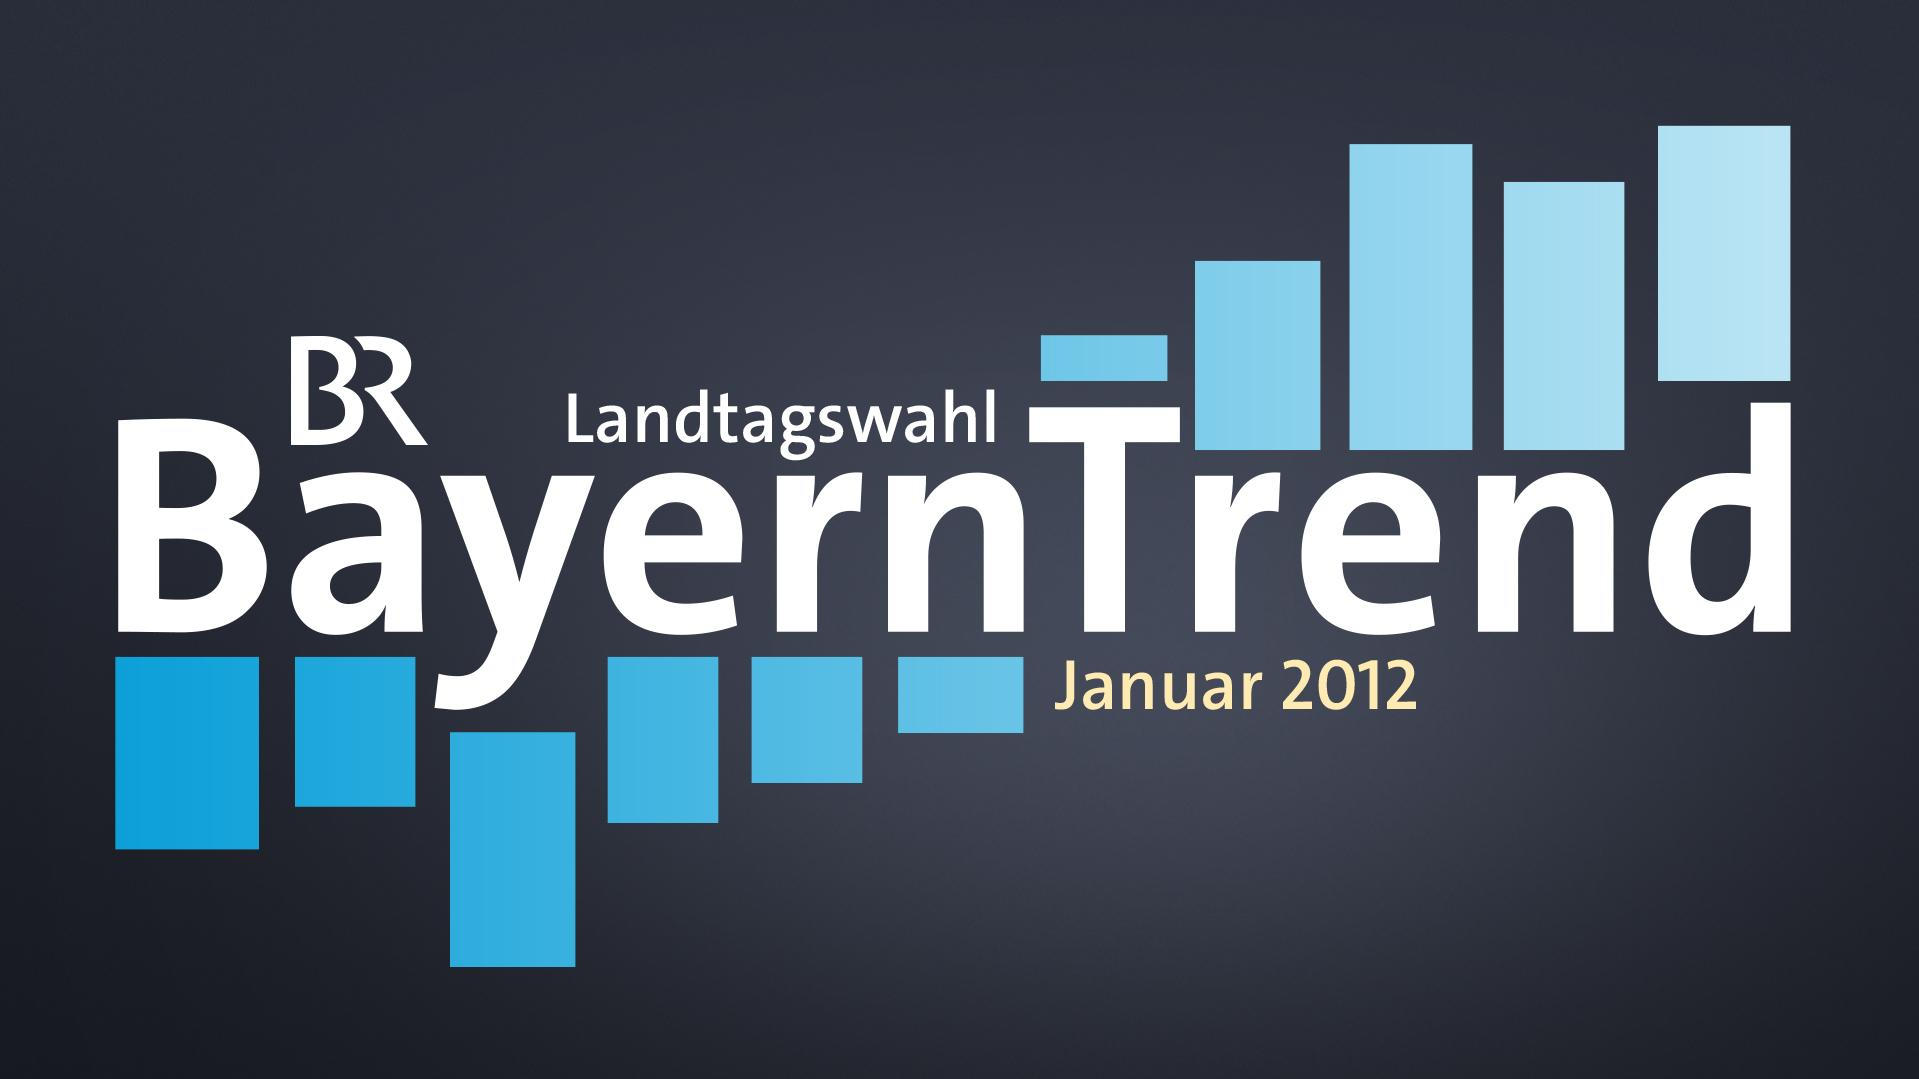 BayernTrend 2012